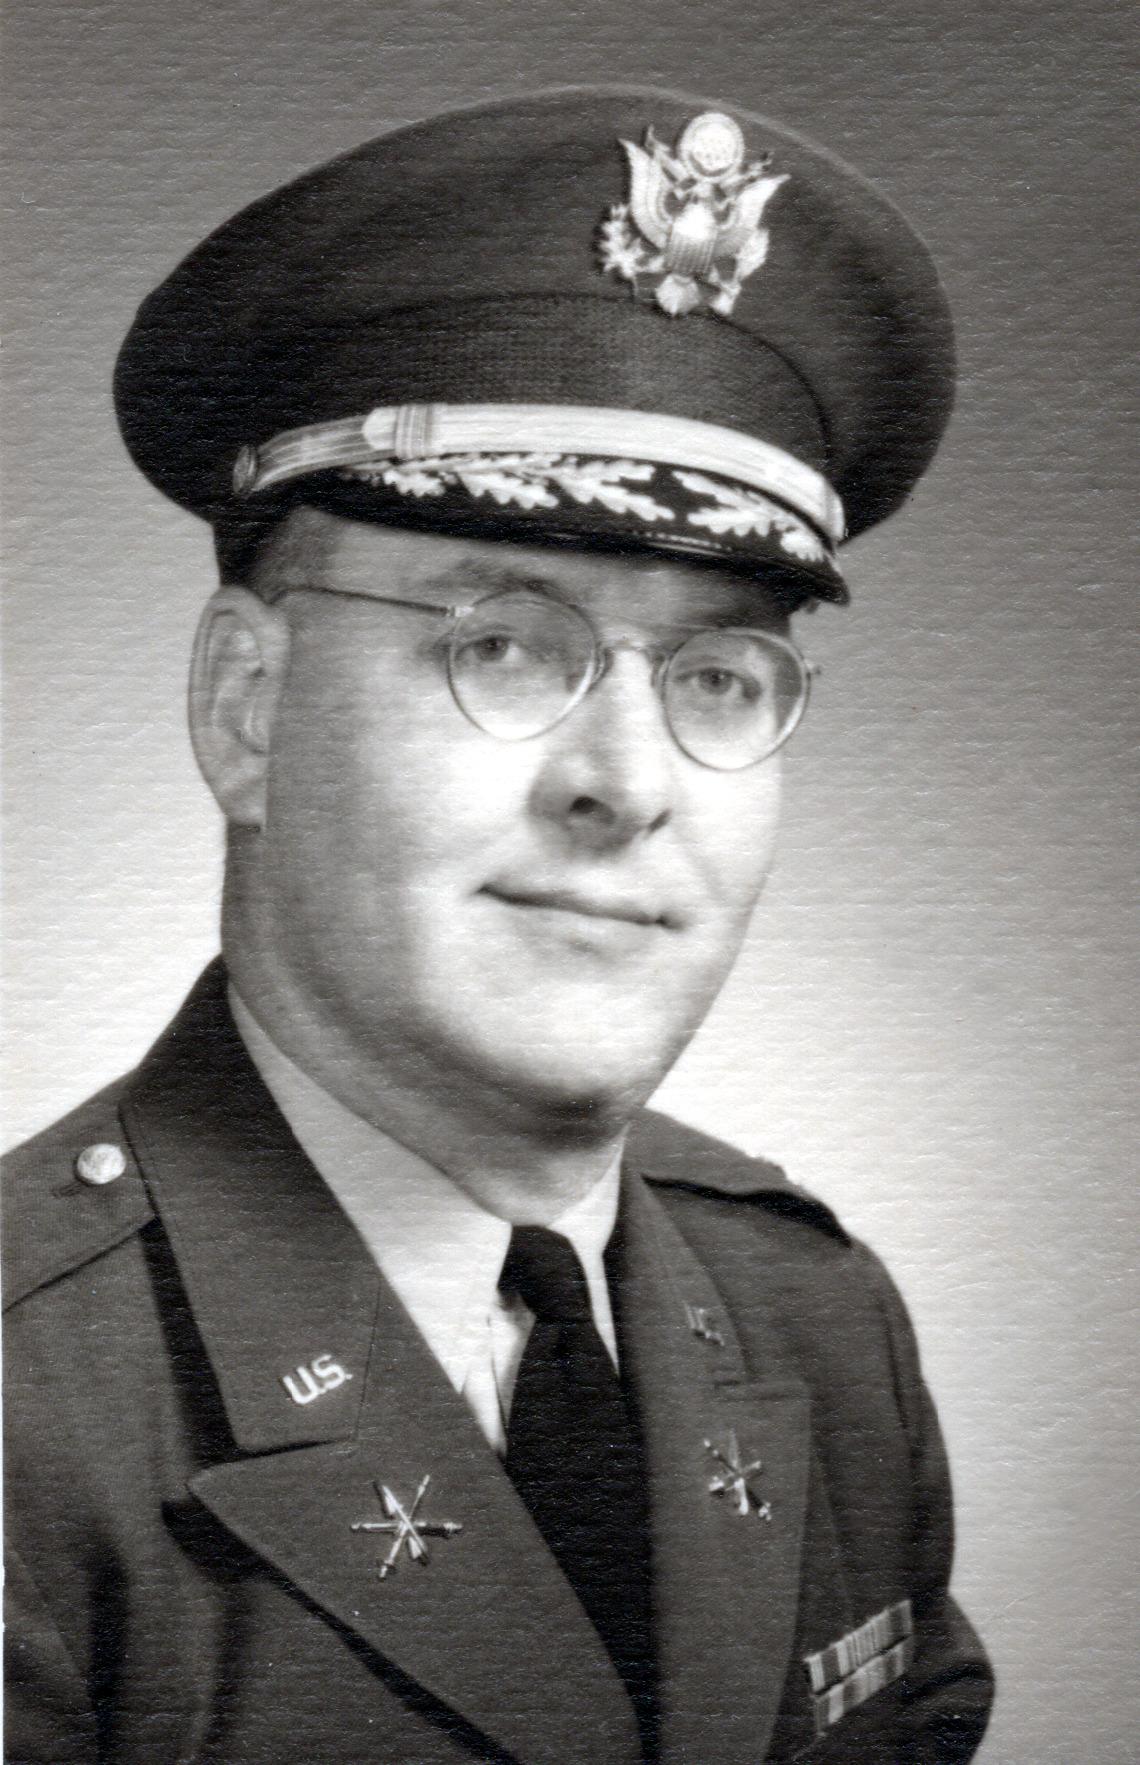 Melvin (Ruth & Frank Mcgrath's Son)